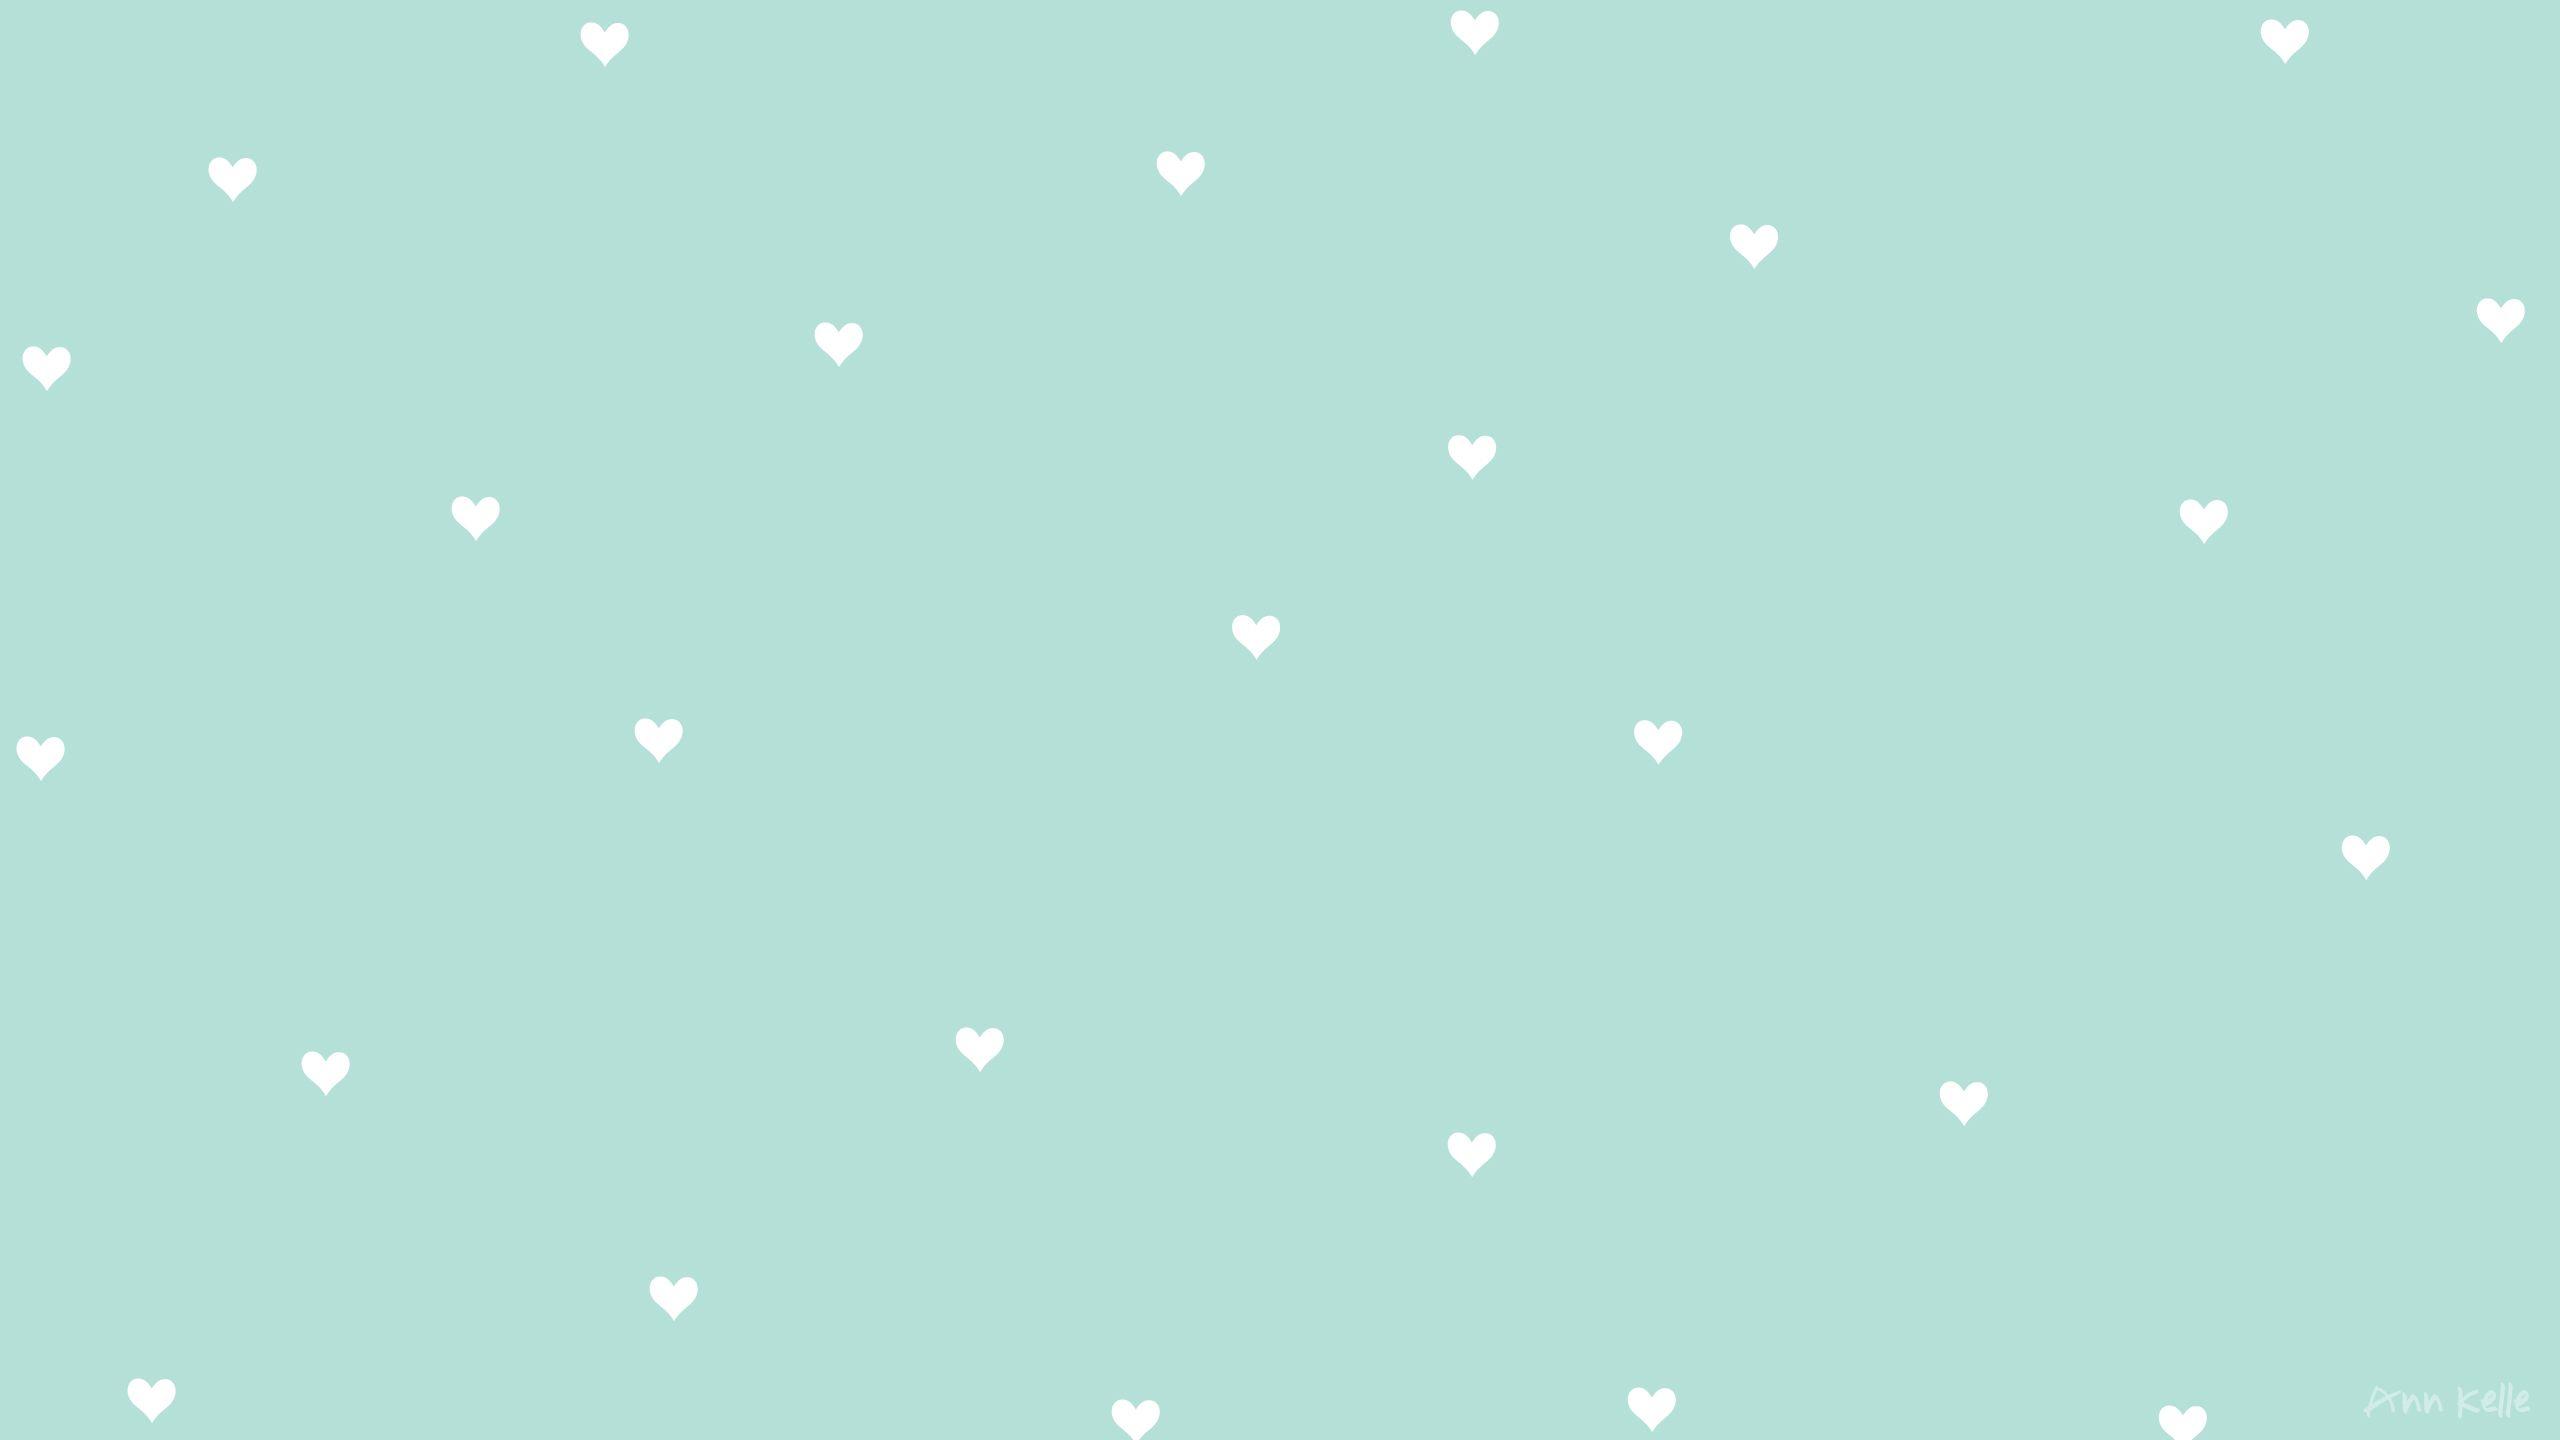 Mint Green Desktop Backgrounds Google Search Mint Green Wallpaper Cute Blue Wallpaper Mint Wallpaper